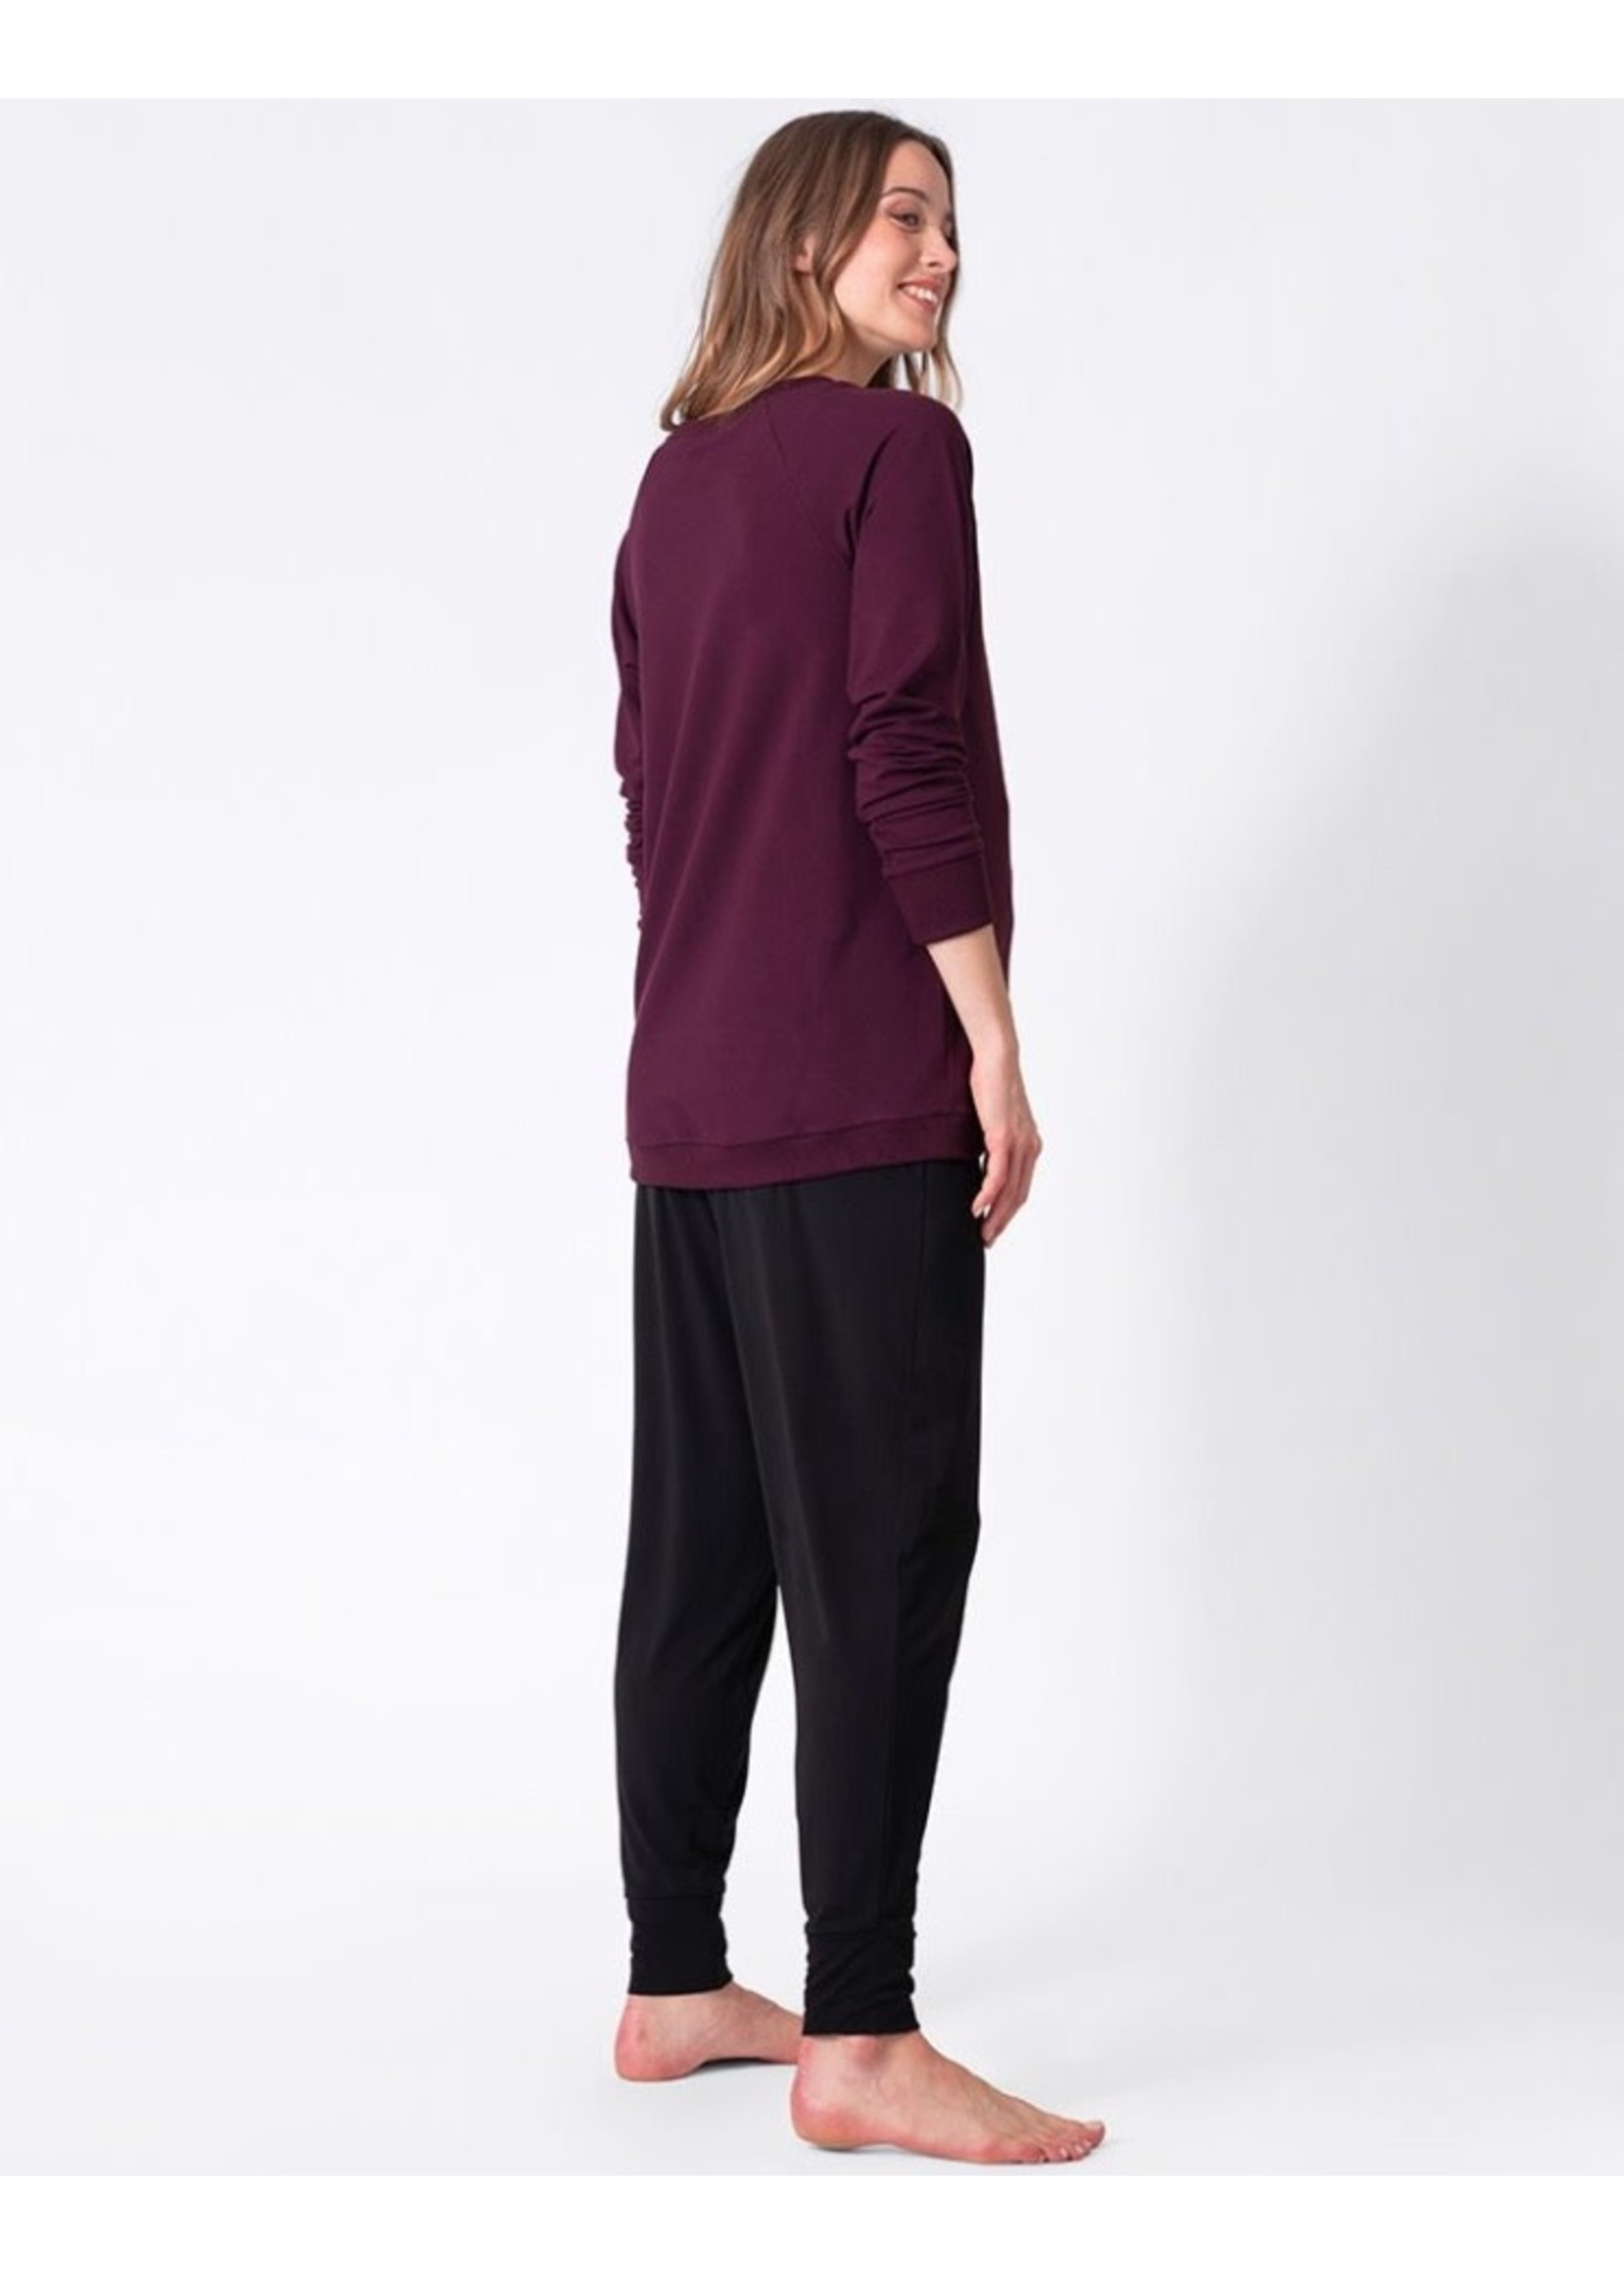 Seraphine Sybil, Crossover Maternity & Nursing Sweater In Burgundy